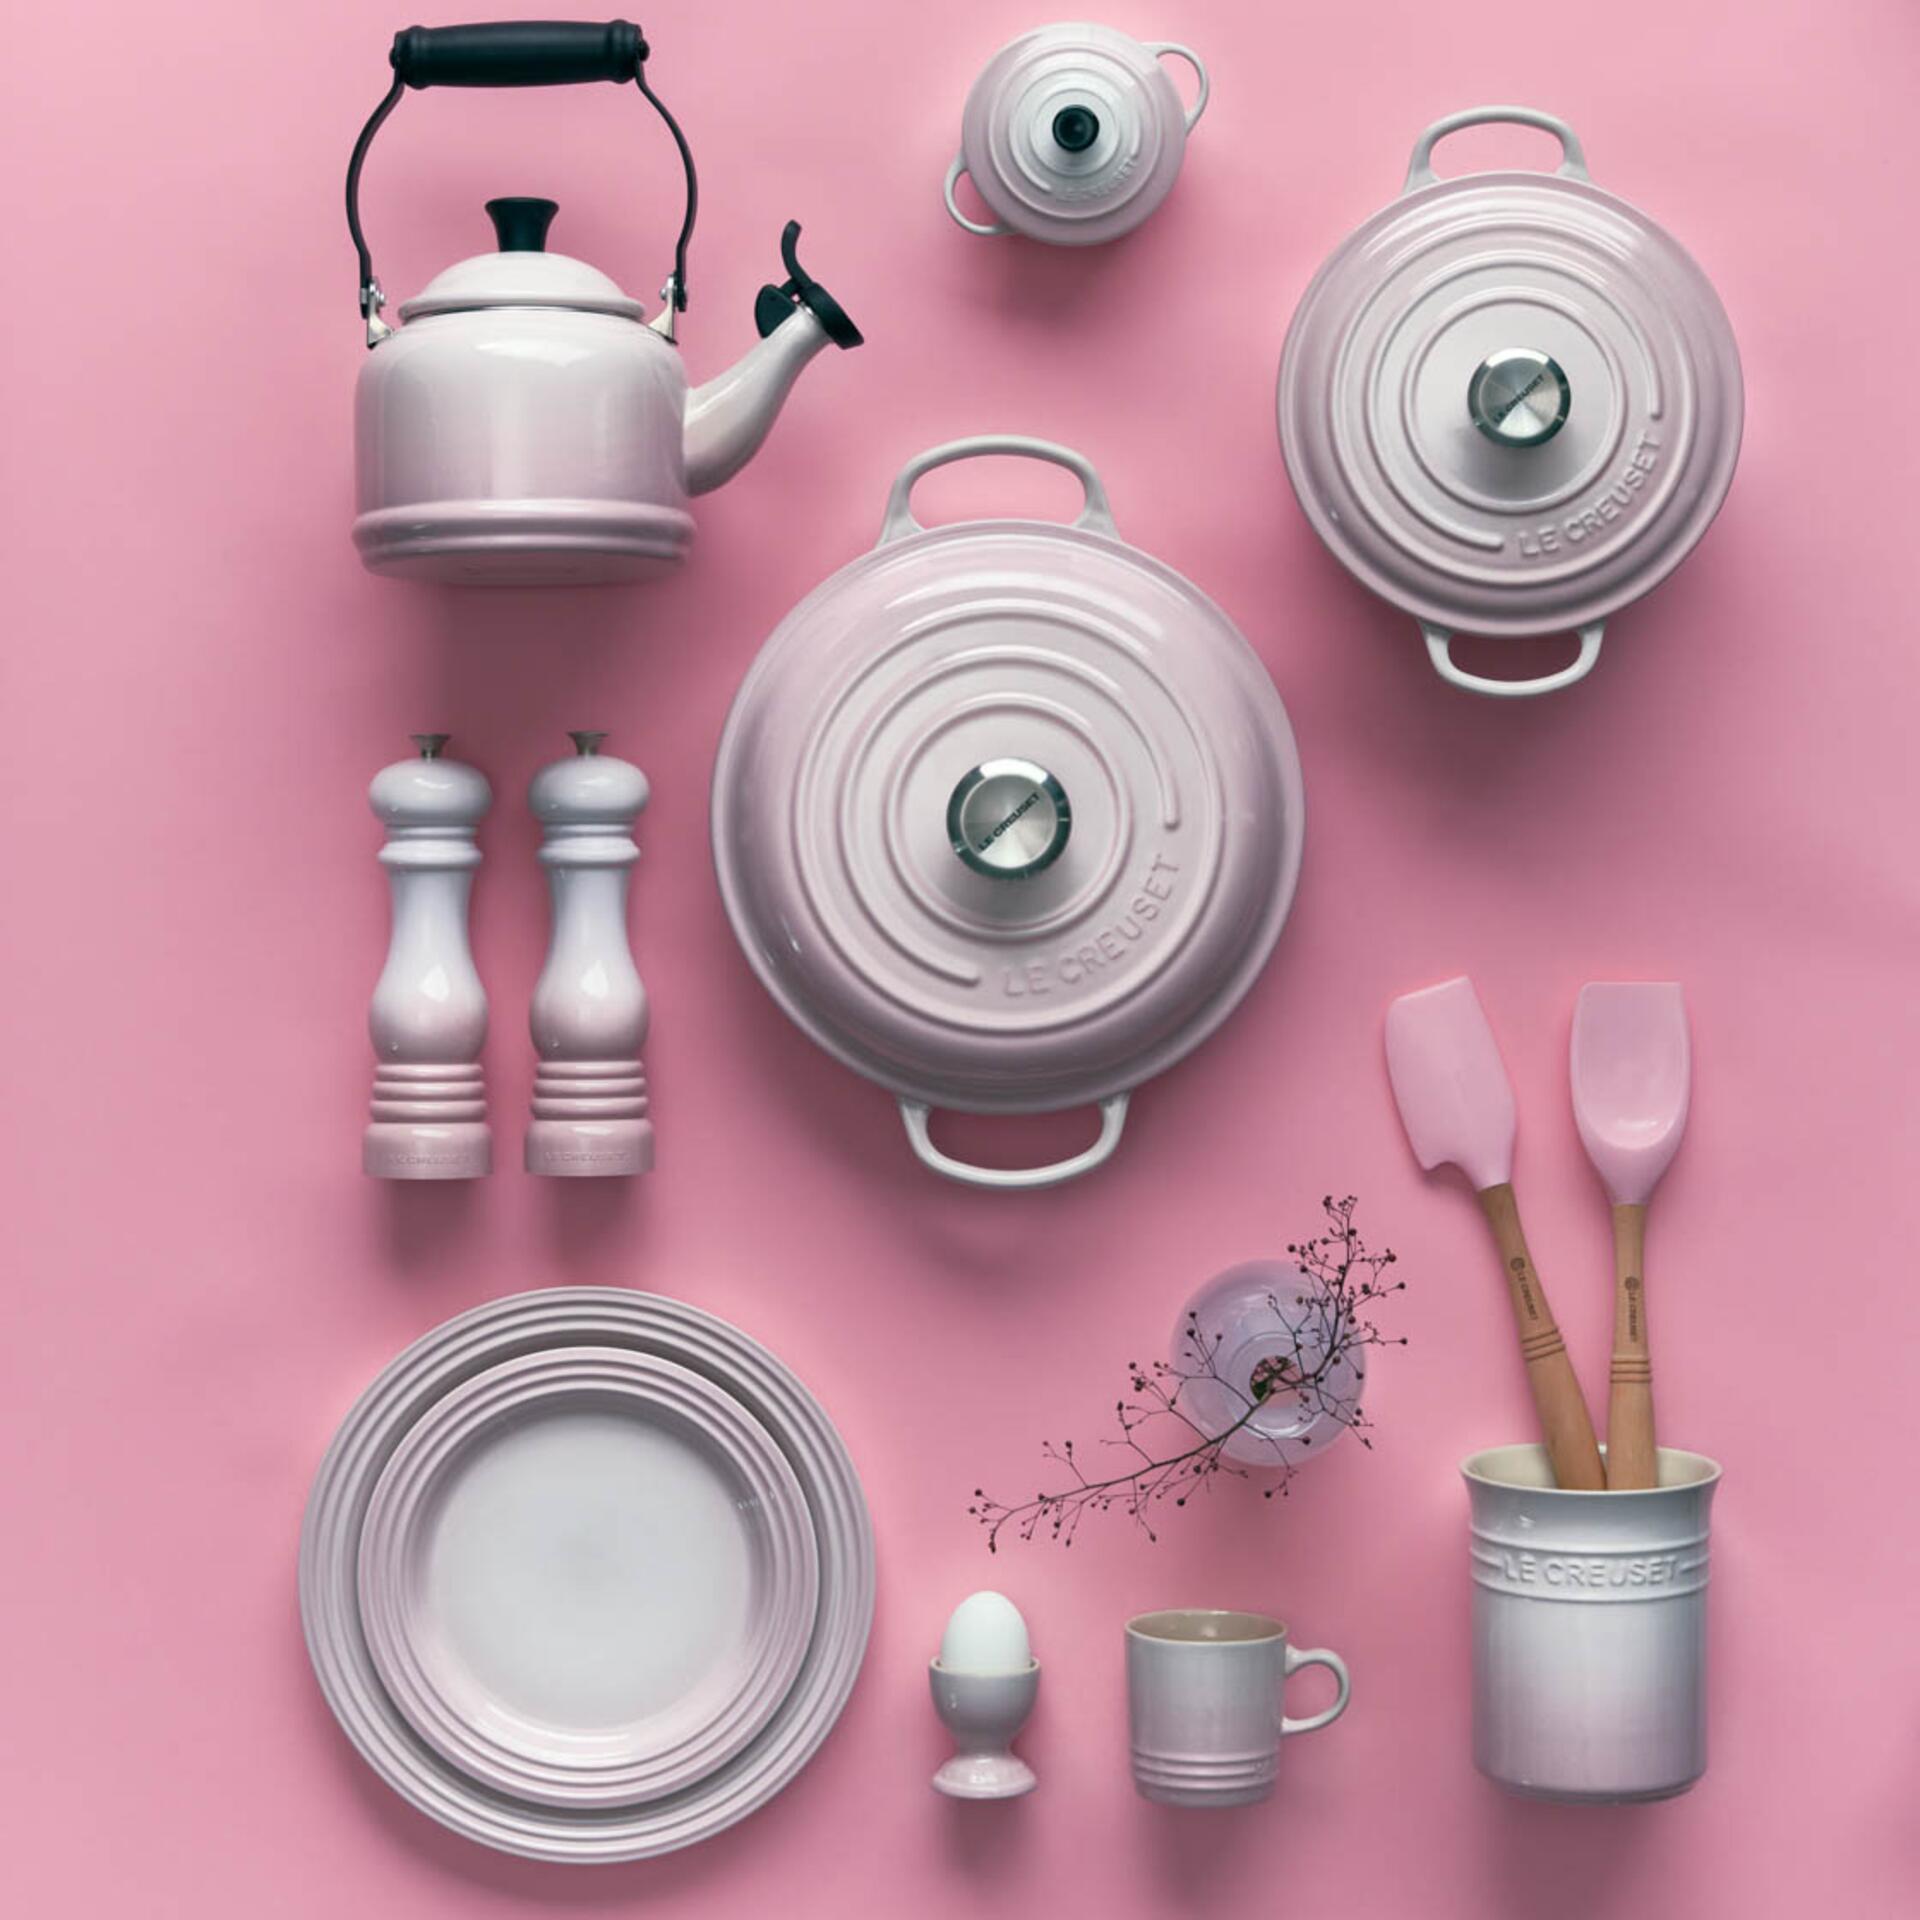 Le Creuset Mühlen-Set Klein Shell Pink 11 cm